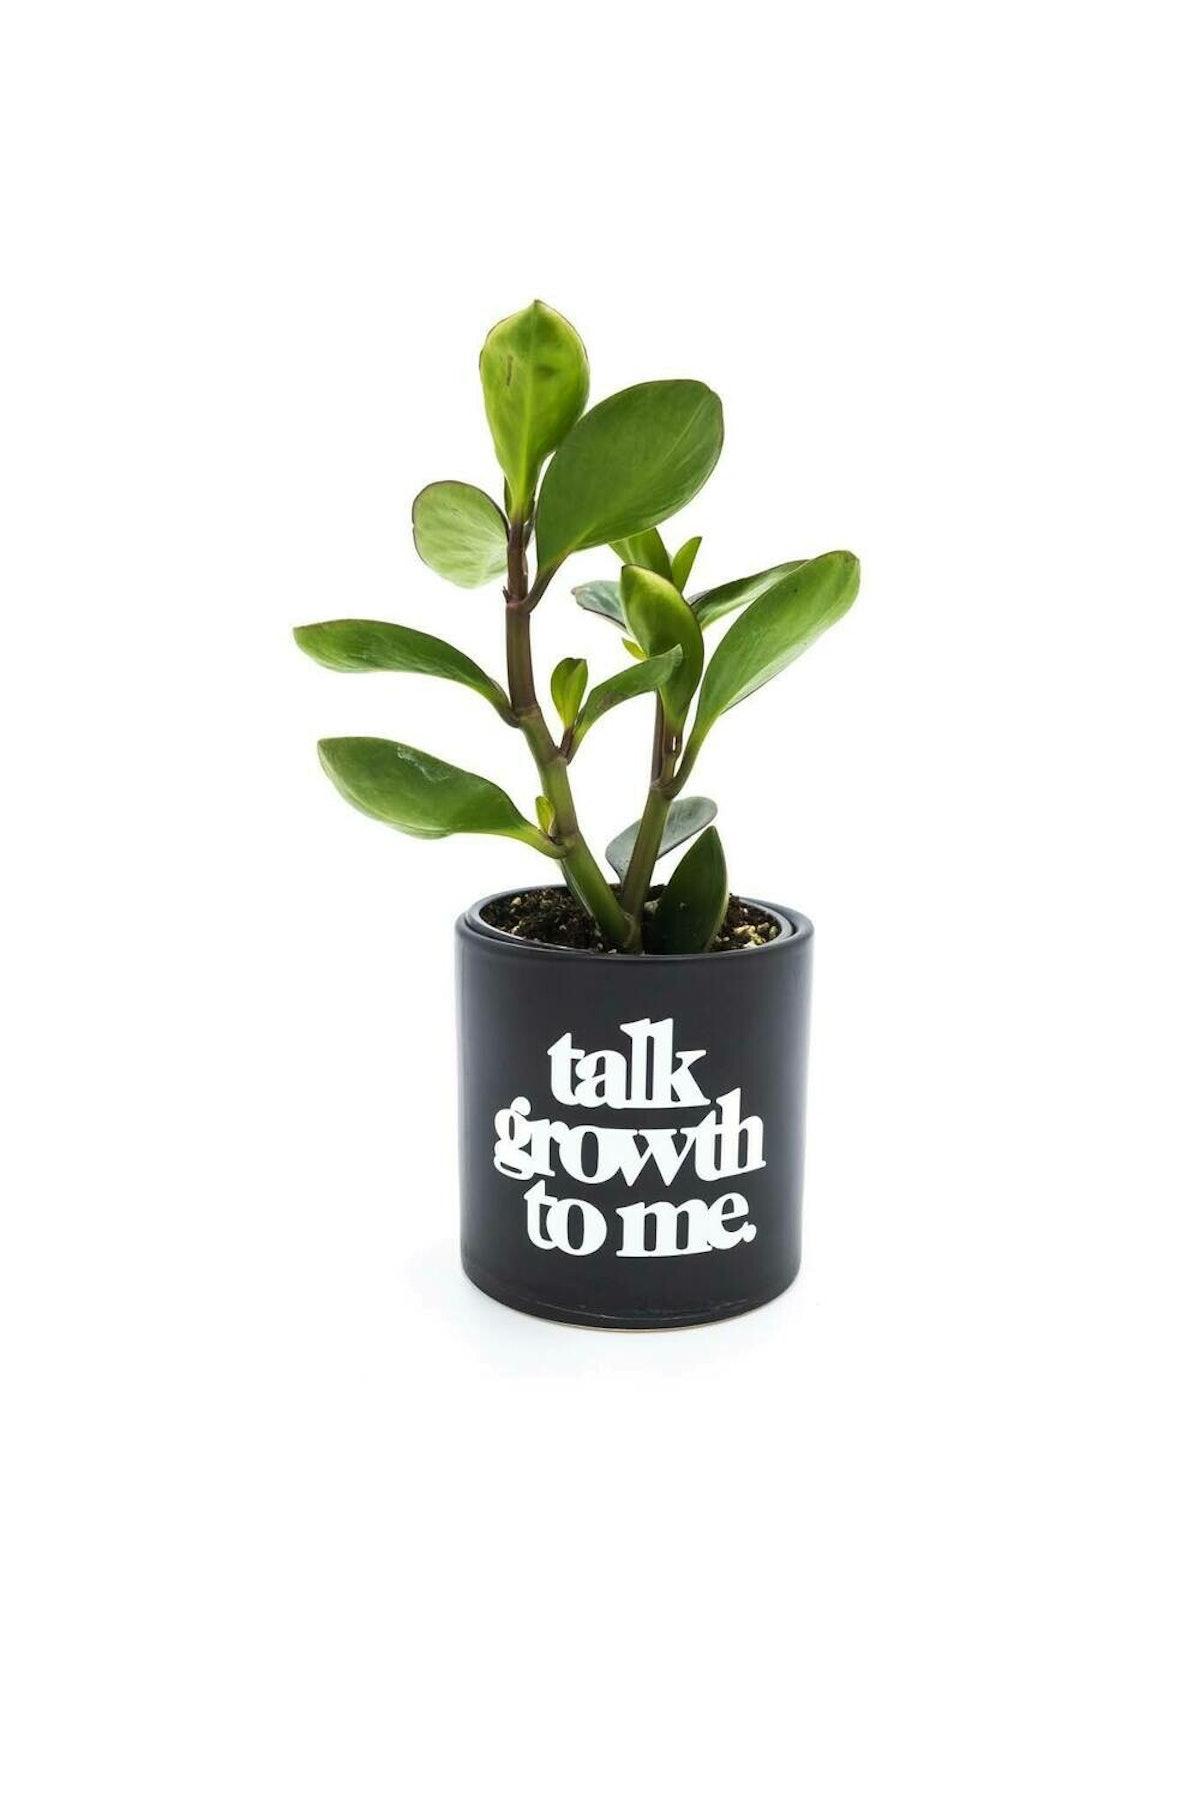 Ceramic Talk Growth To Me Planter